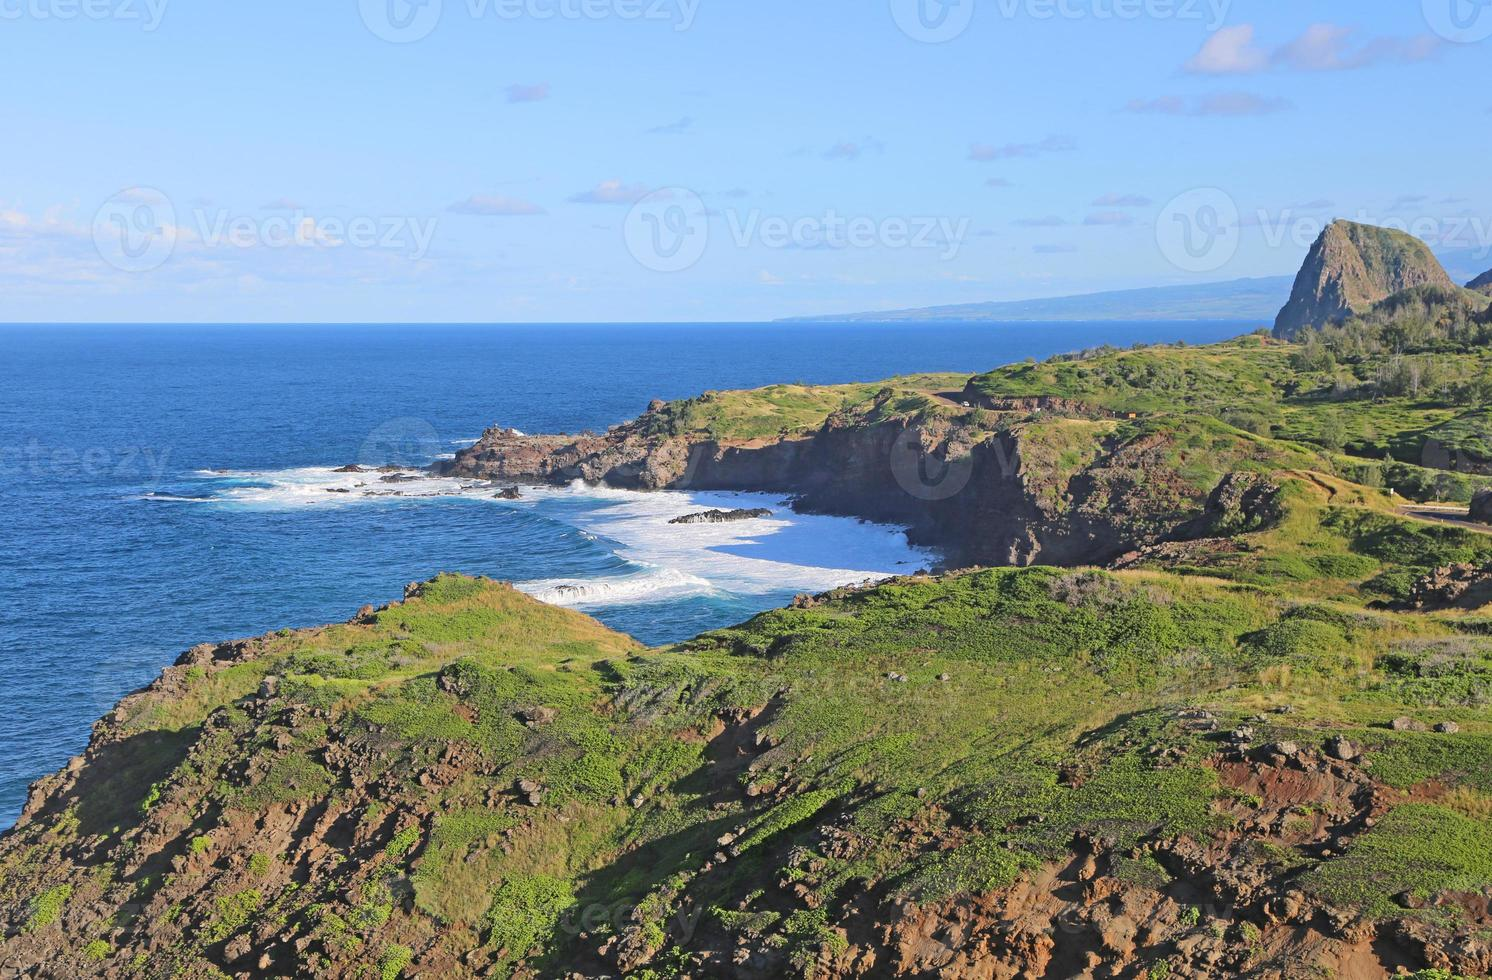 Coast of Maui with Kahakuloa Head photo